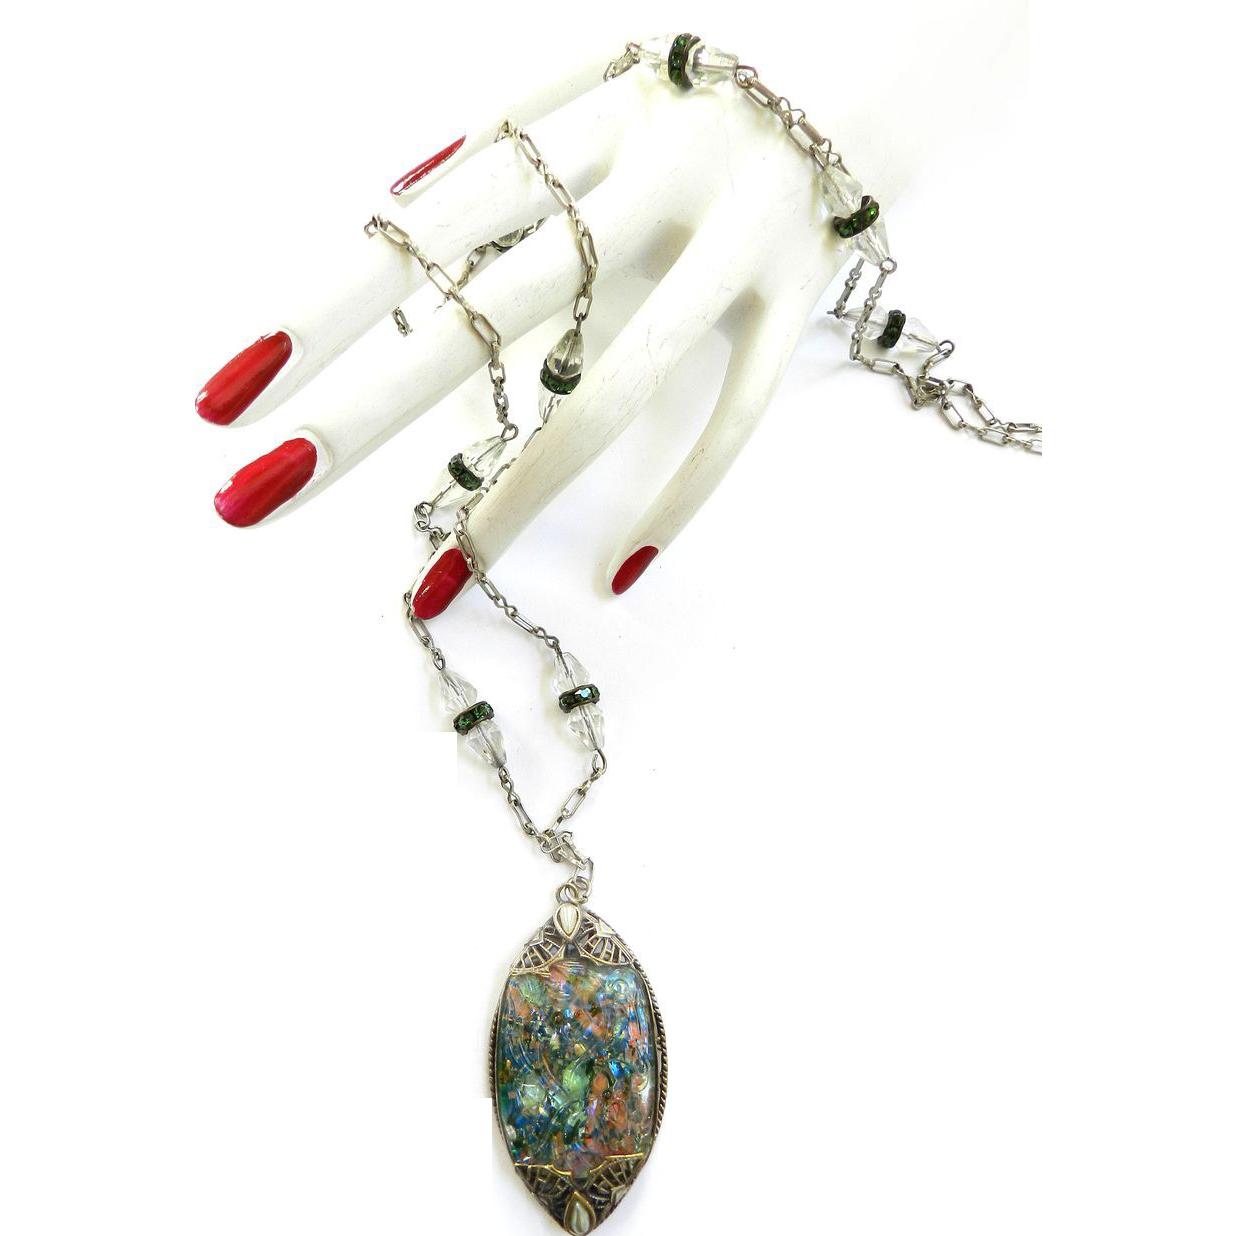 Magnificent 1920s flapper Crystal Huge Pendant Glass Stones